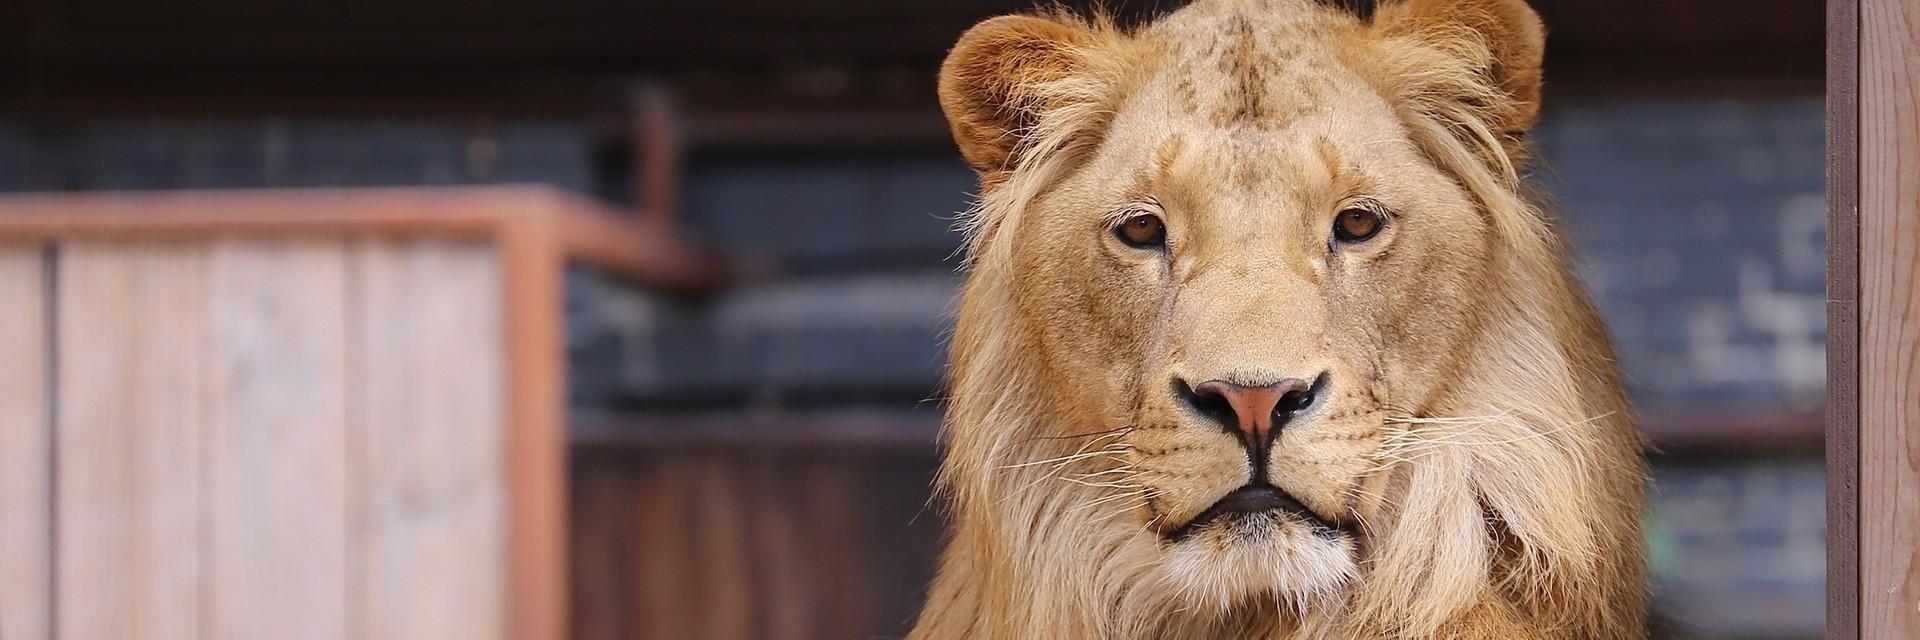 Lion Terez